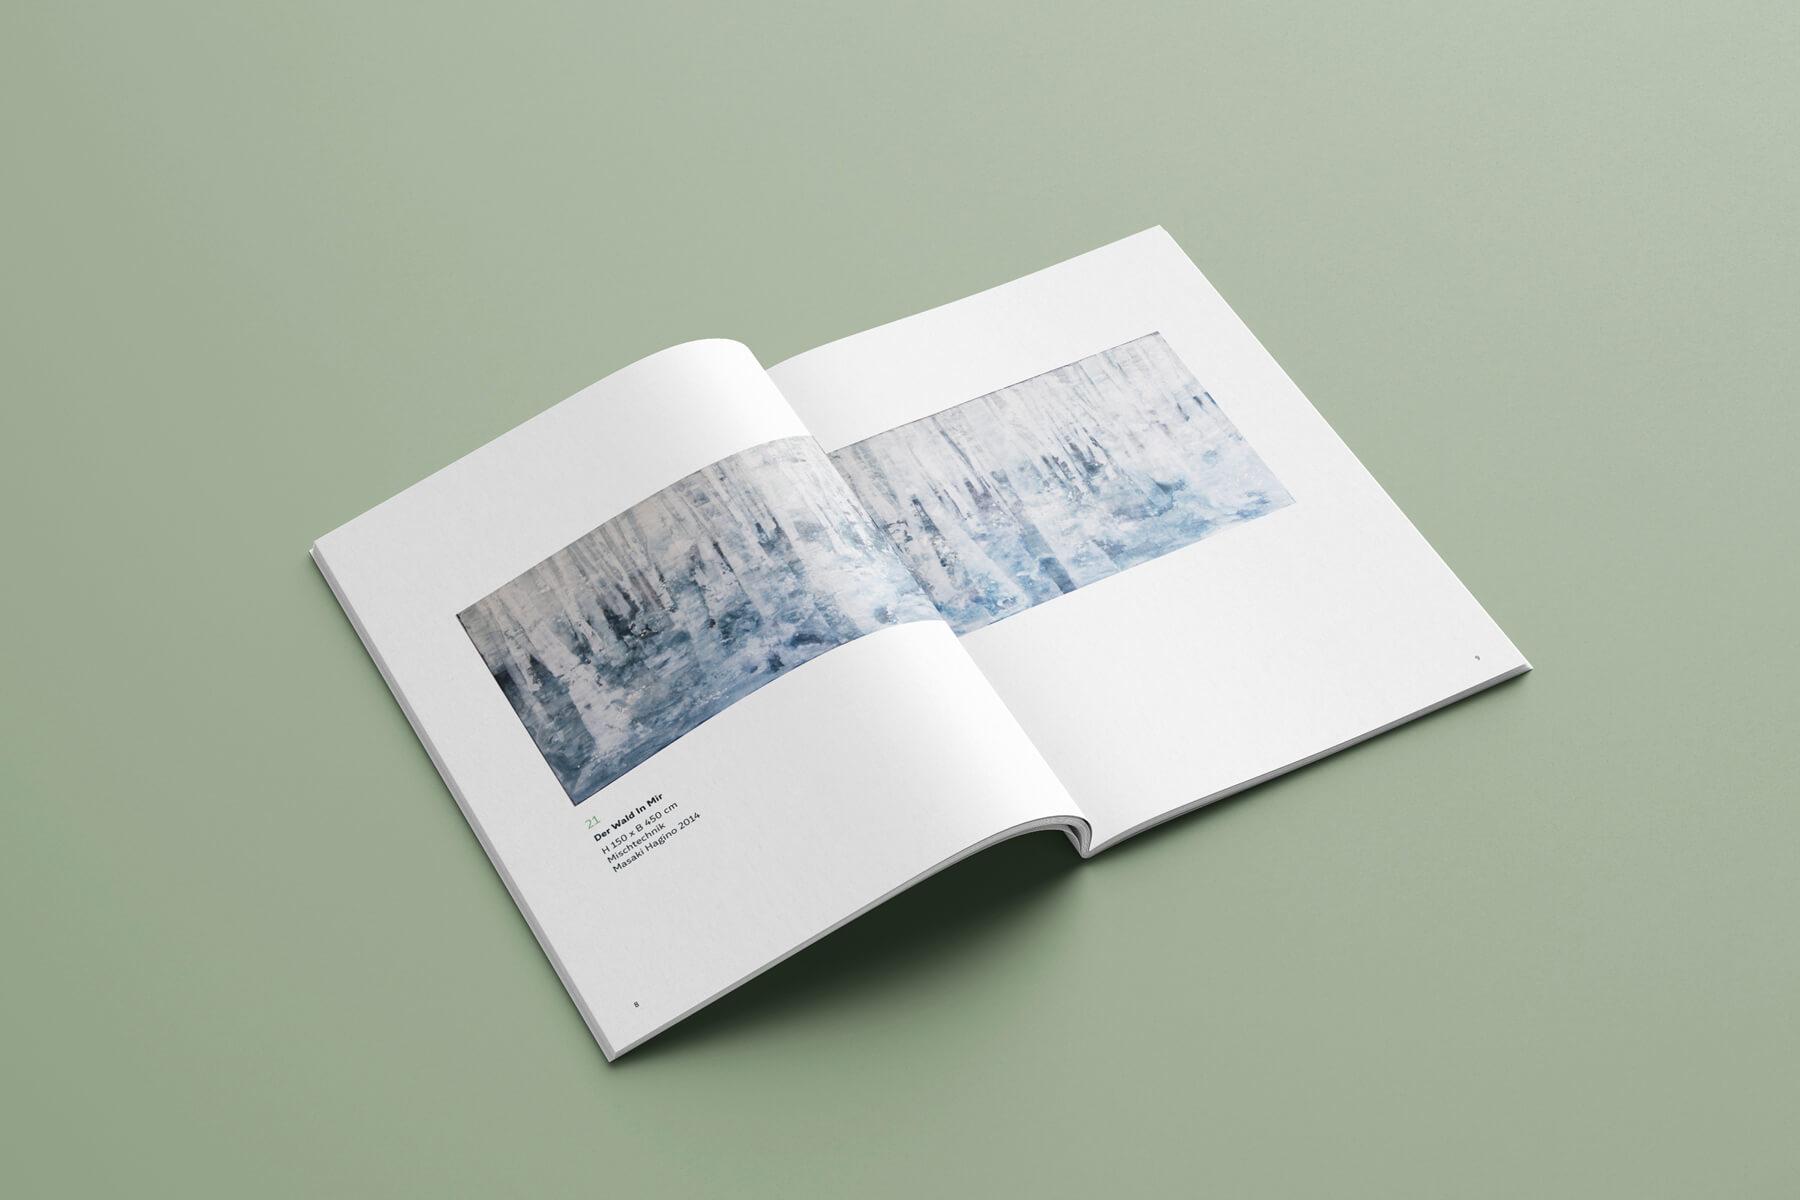 grafikdesign-janis-weidner-lindau-bodensee-katalog-04